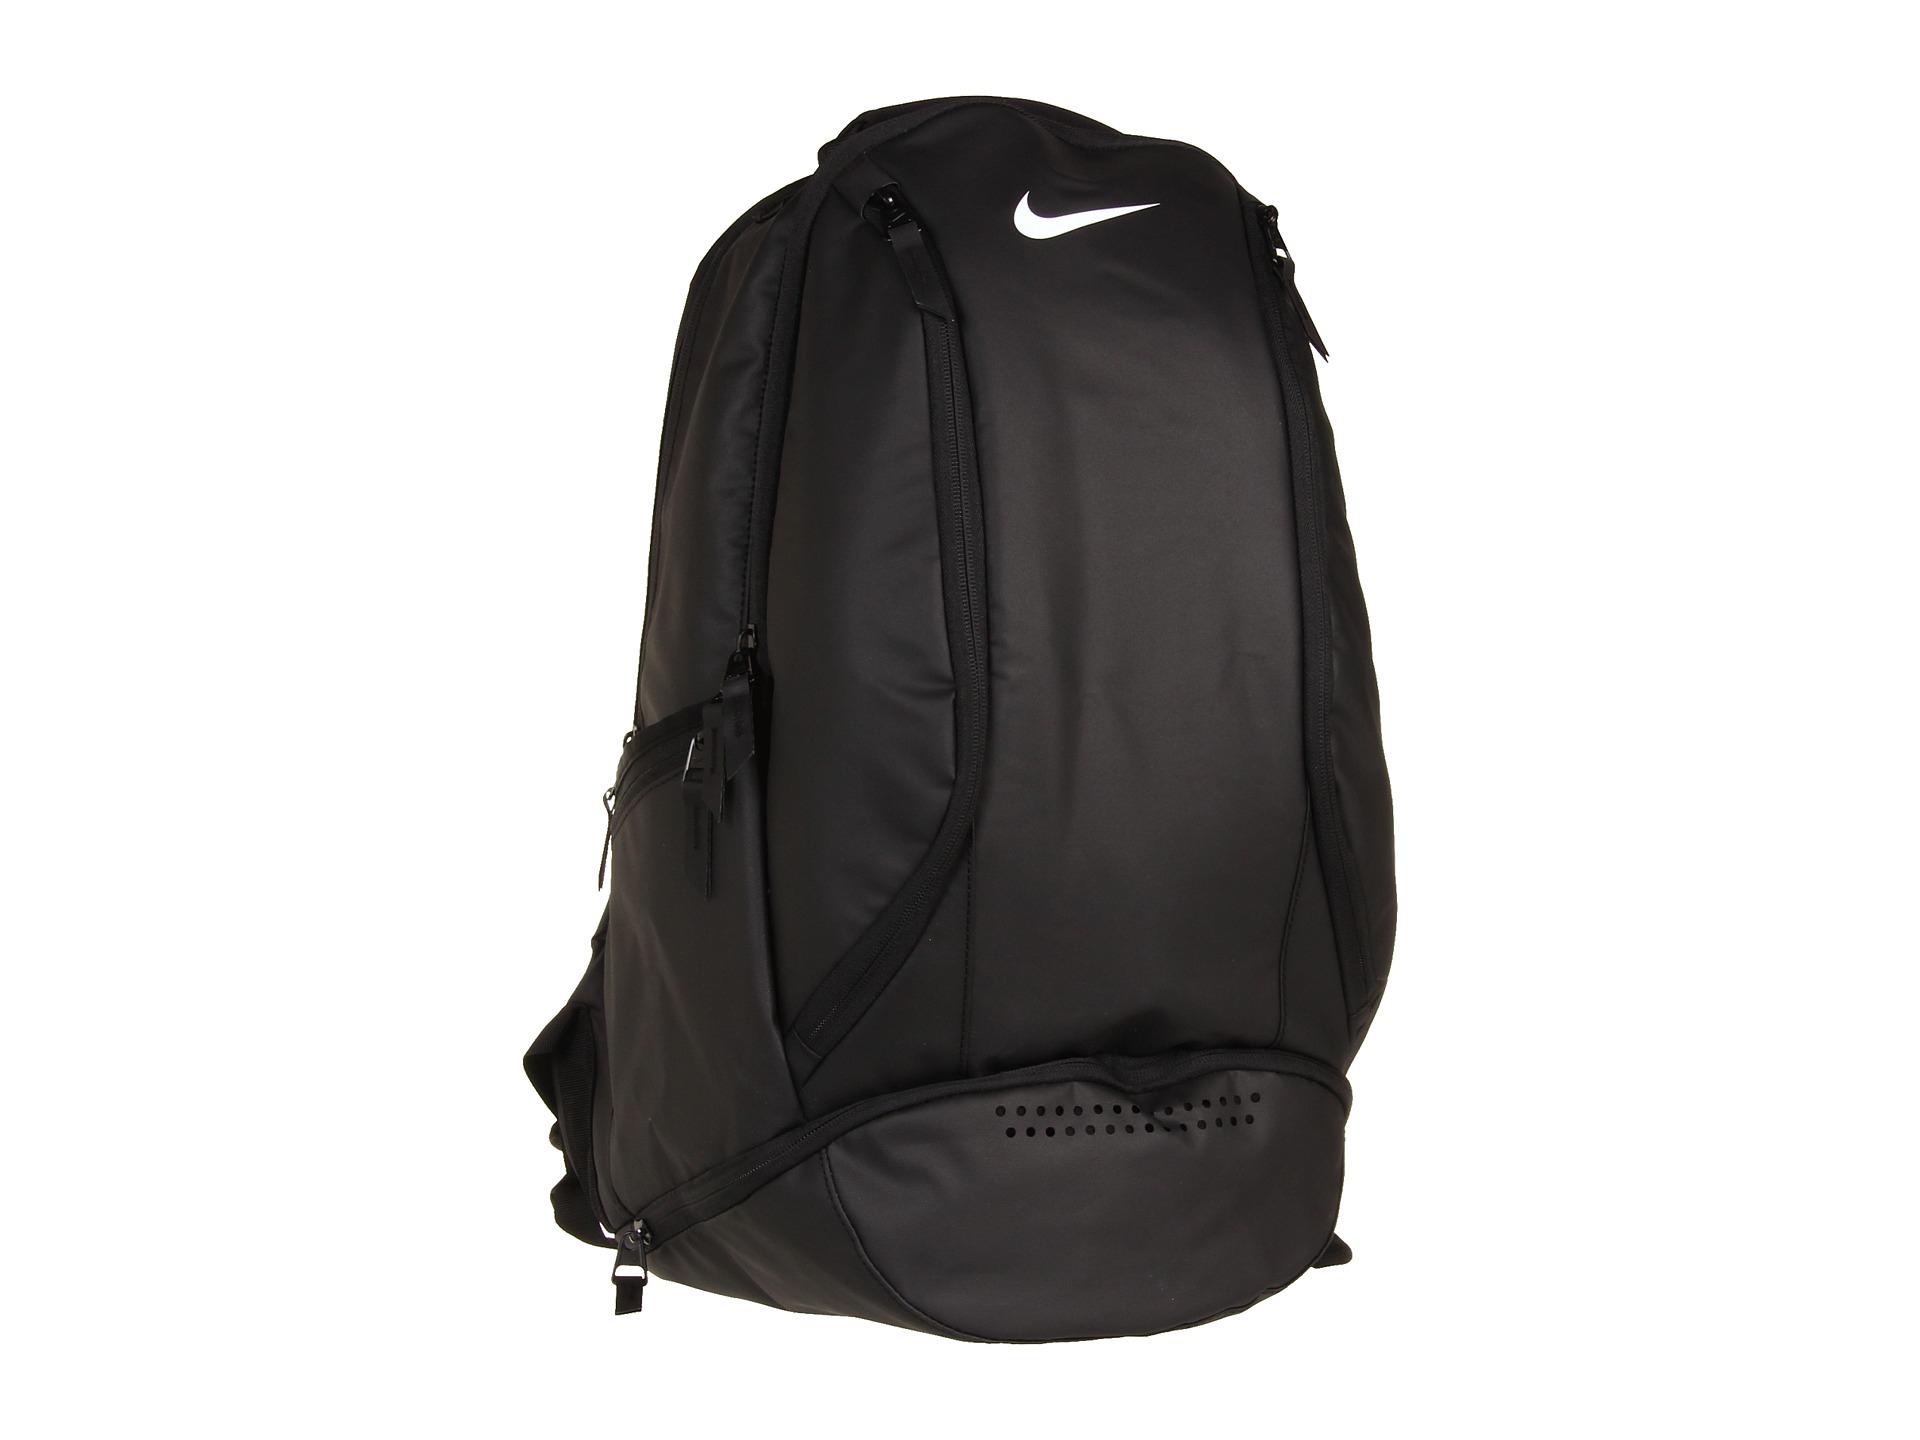 nike ultimatum max air gear backpack in black lyst